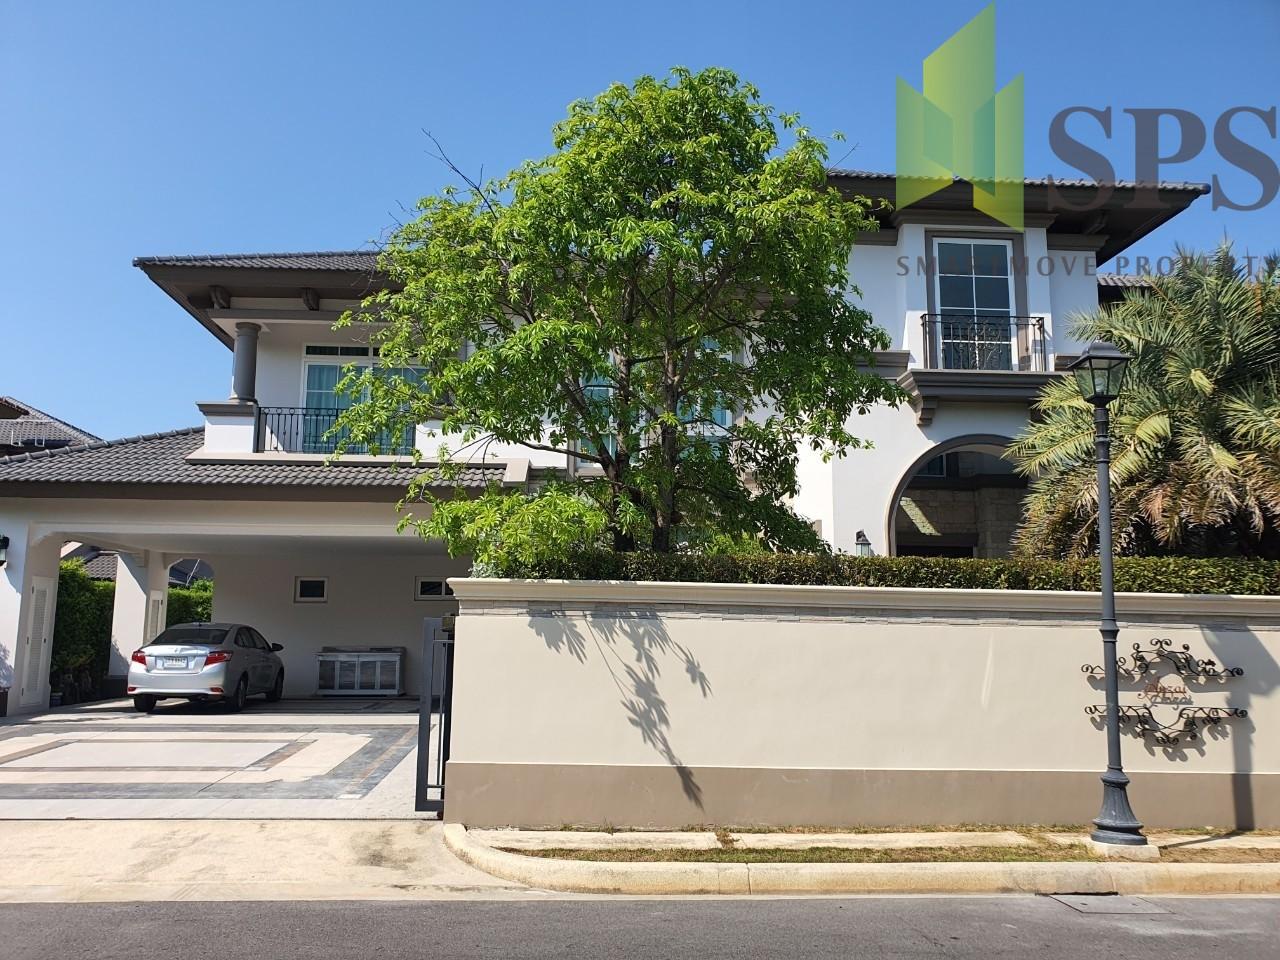 For Sale Luxury Single House NANTAWAN BANGNA KM.7ขายบ้านหรูโครงการนันวัน บางนา กม.7 (SPS Ann408)